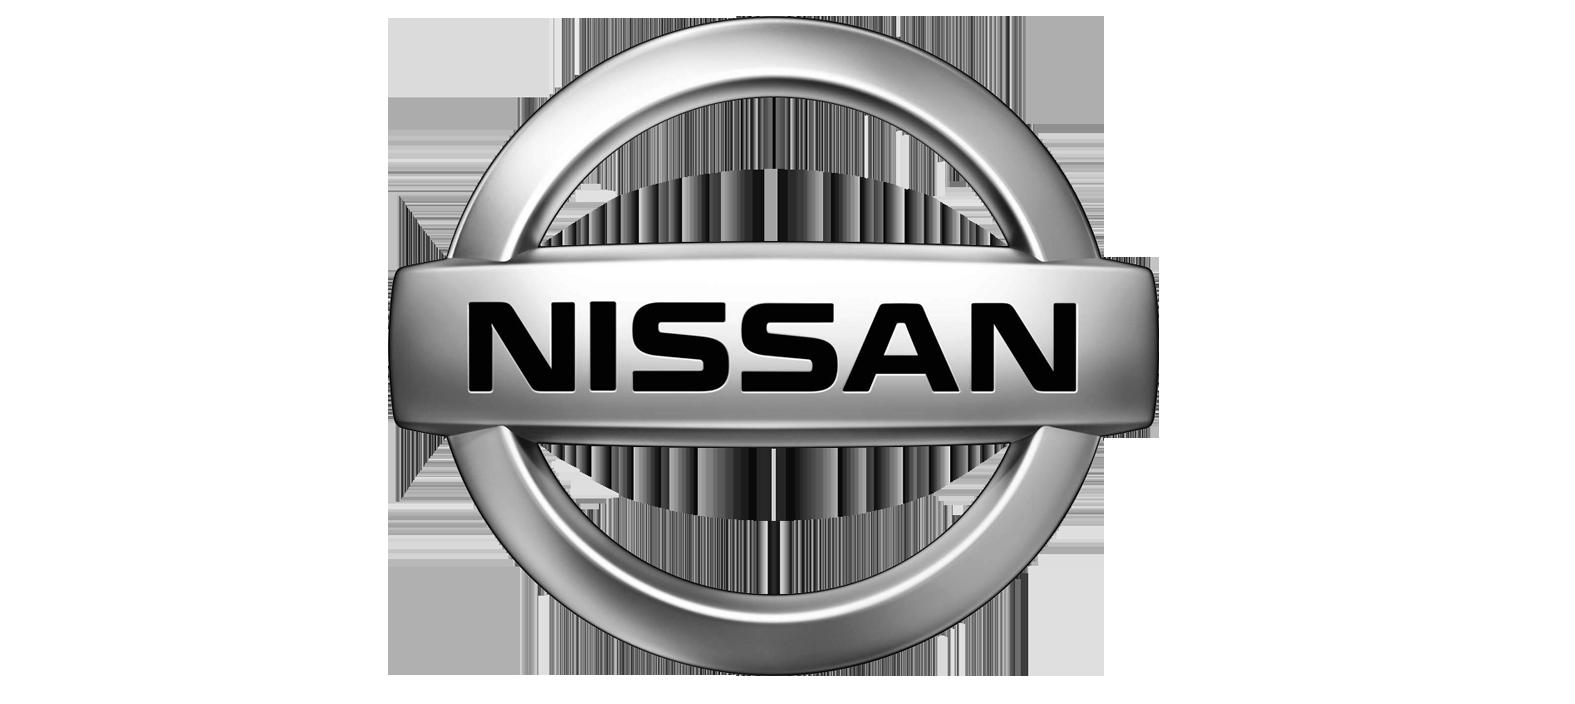 logo Nissan Nissan, Logos, Car logos